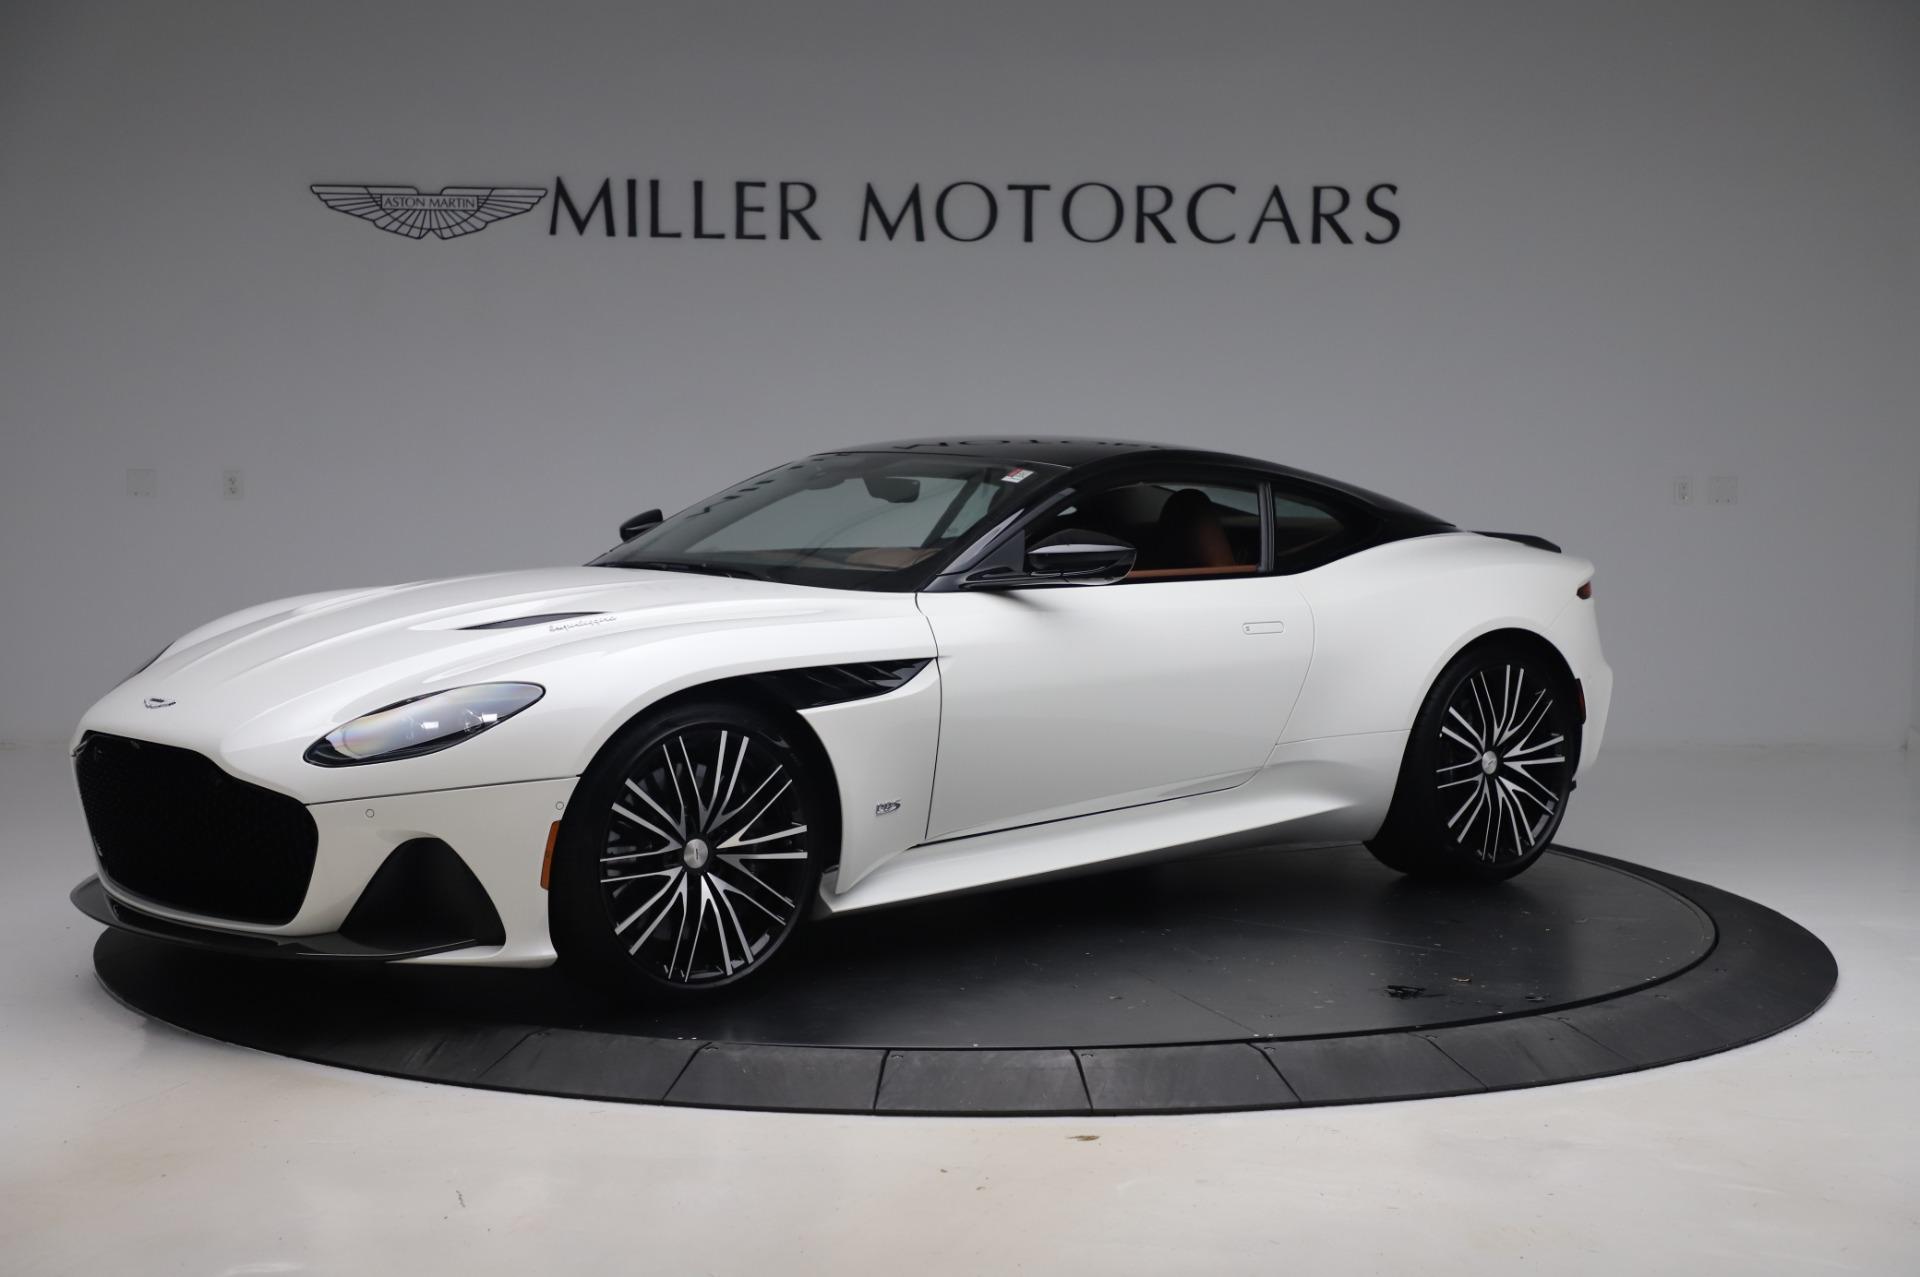 New 2020 Aston Martin DBS Superleggera Coupe for sale $337,686 at Alfa Romeo of Westport in Westport CT 06880 1